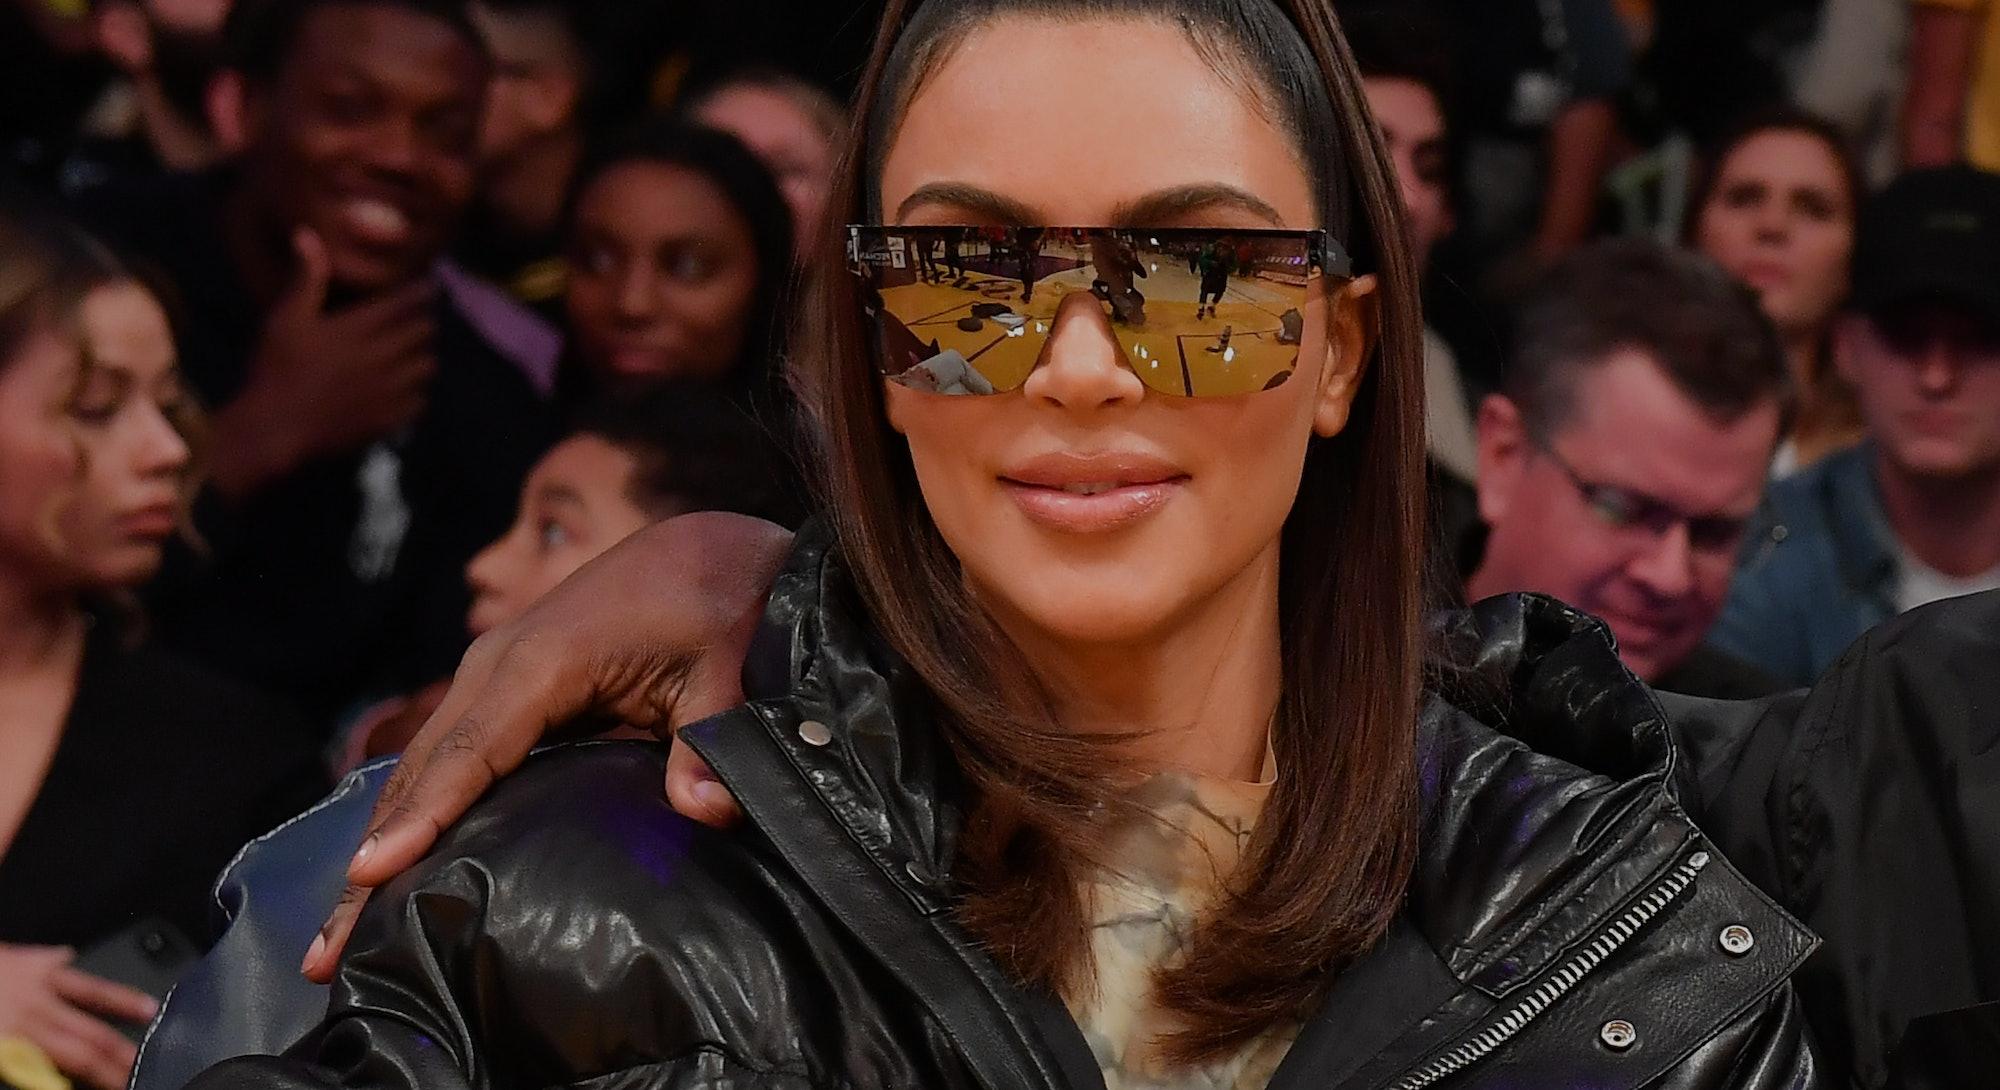 LOS ANGELES, CALIFORNIA - JANUARY 13: Kim Kardashian attends a basketball game between the Los Angel...